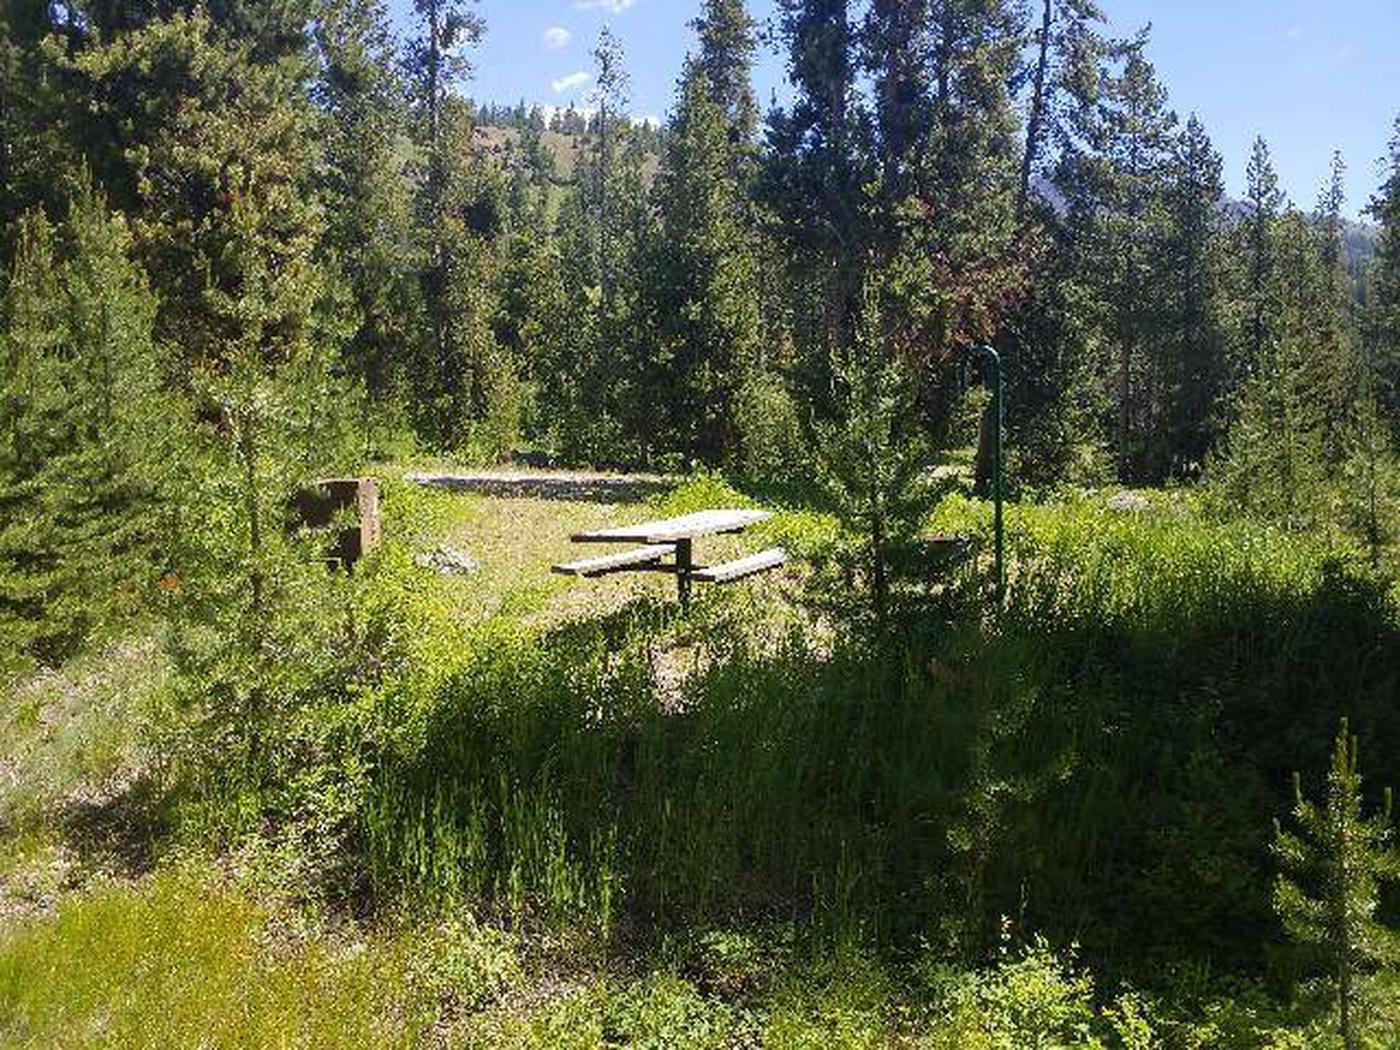 Threemile Campground Campsite 18 - Back View